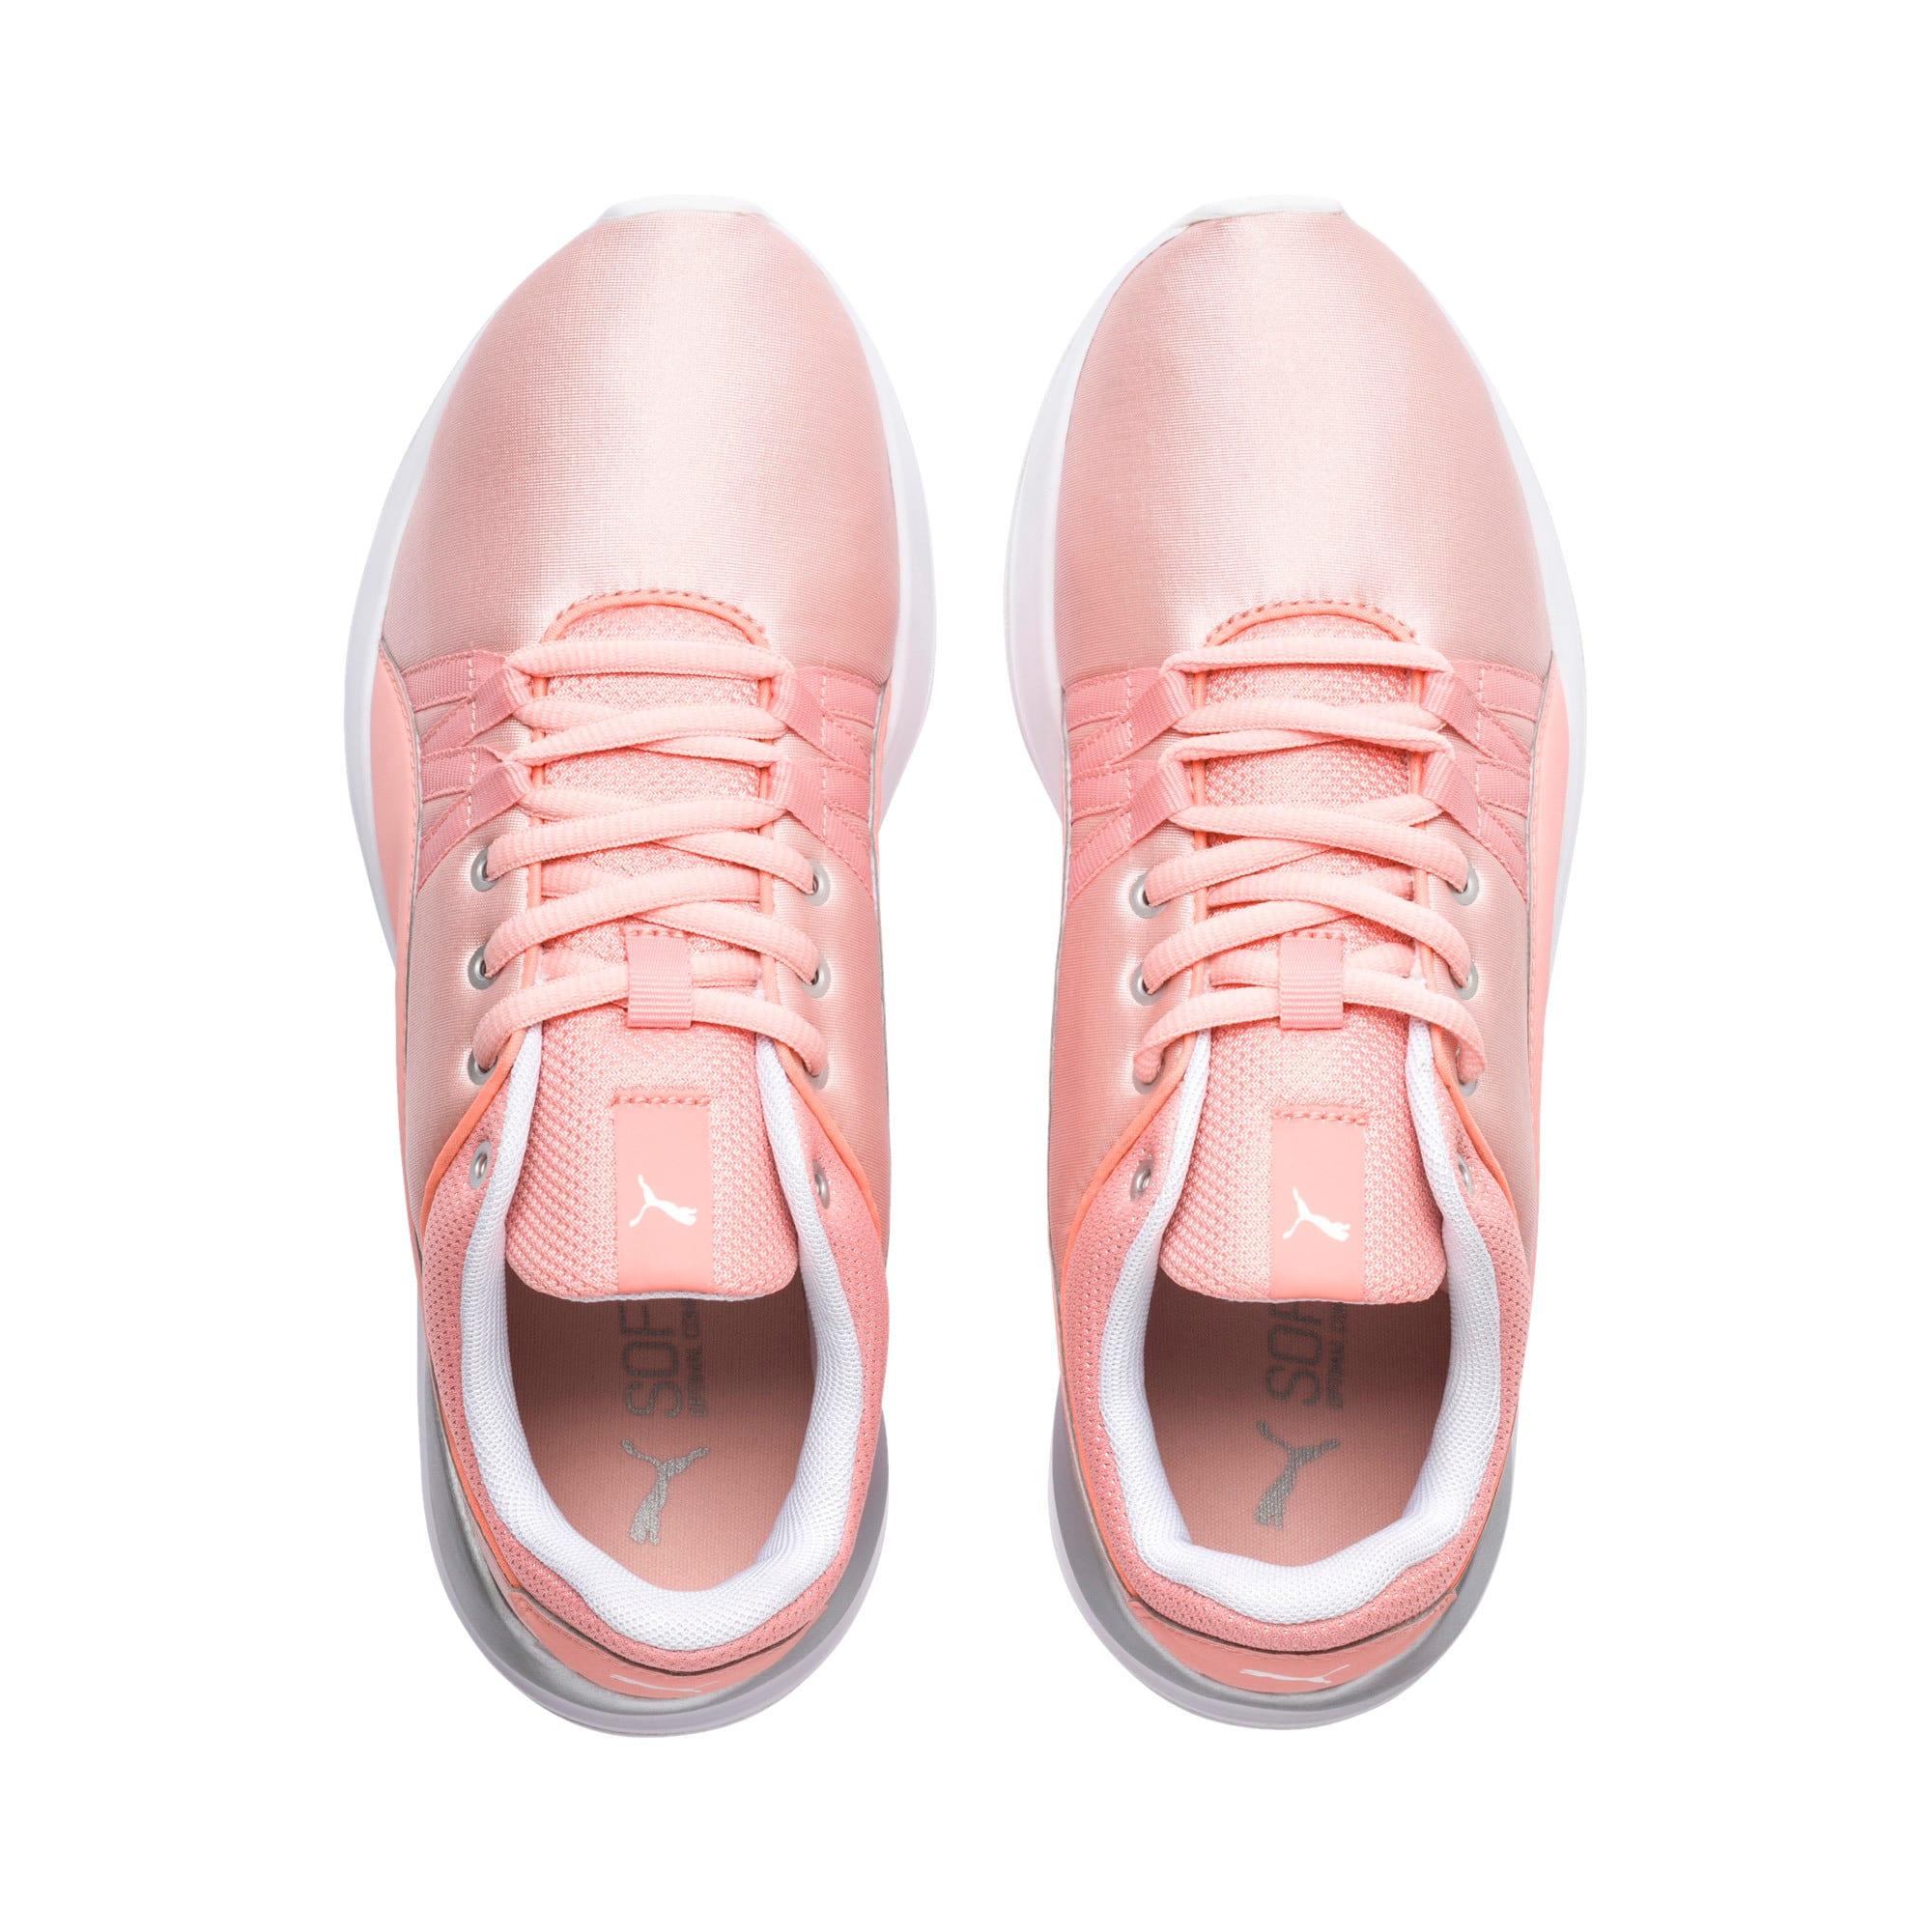 Thumbnail 6 of Adela Women's Sneakers, Peach Bud-Peach Bud, medium